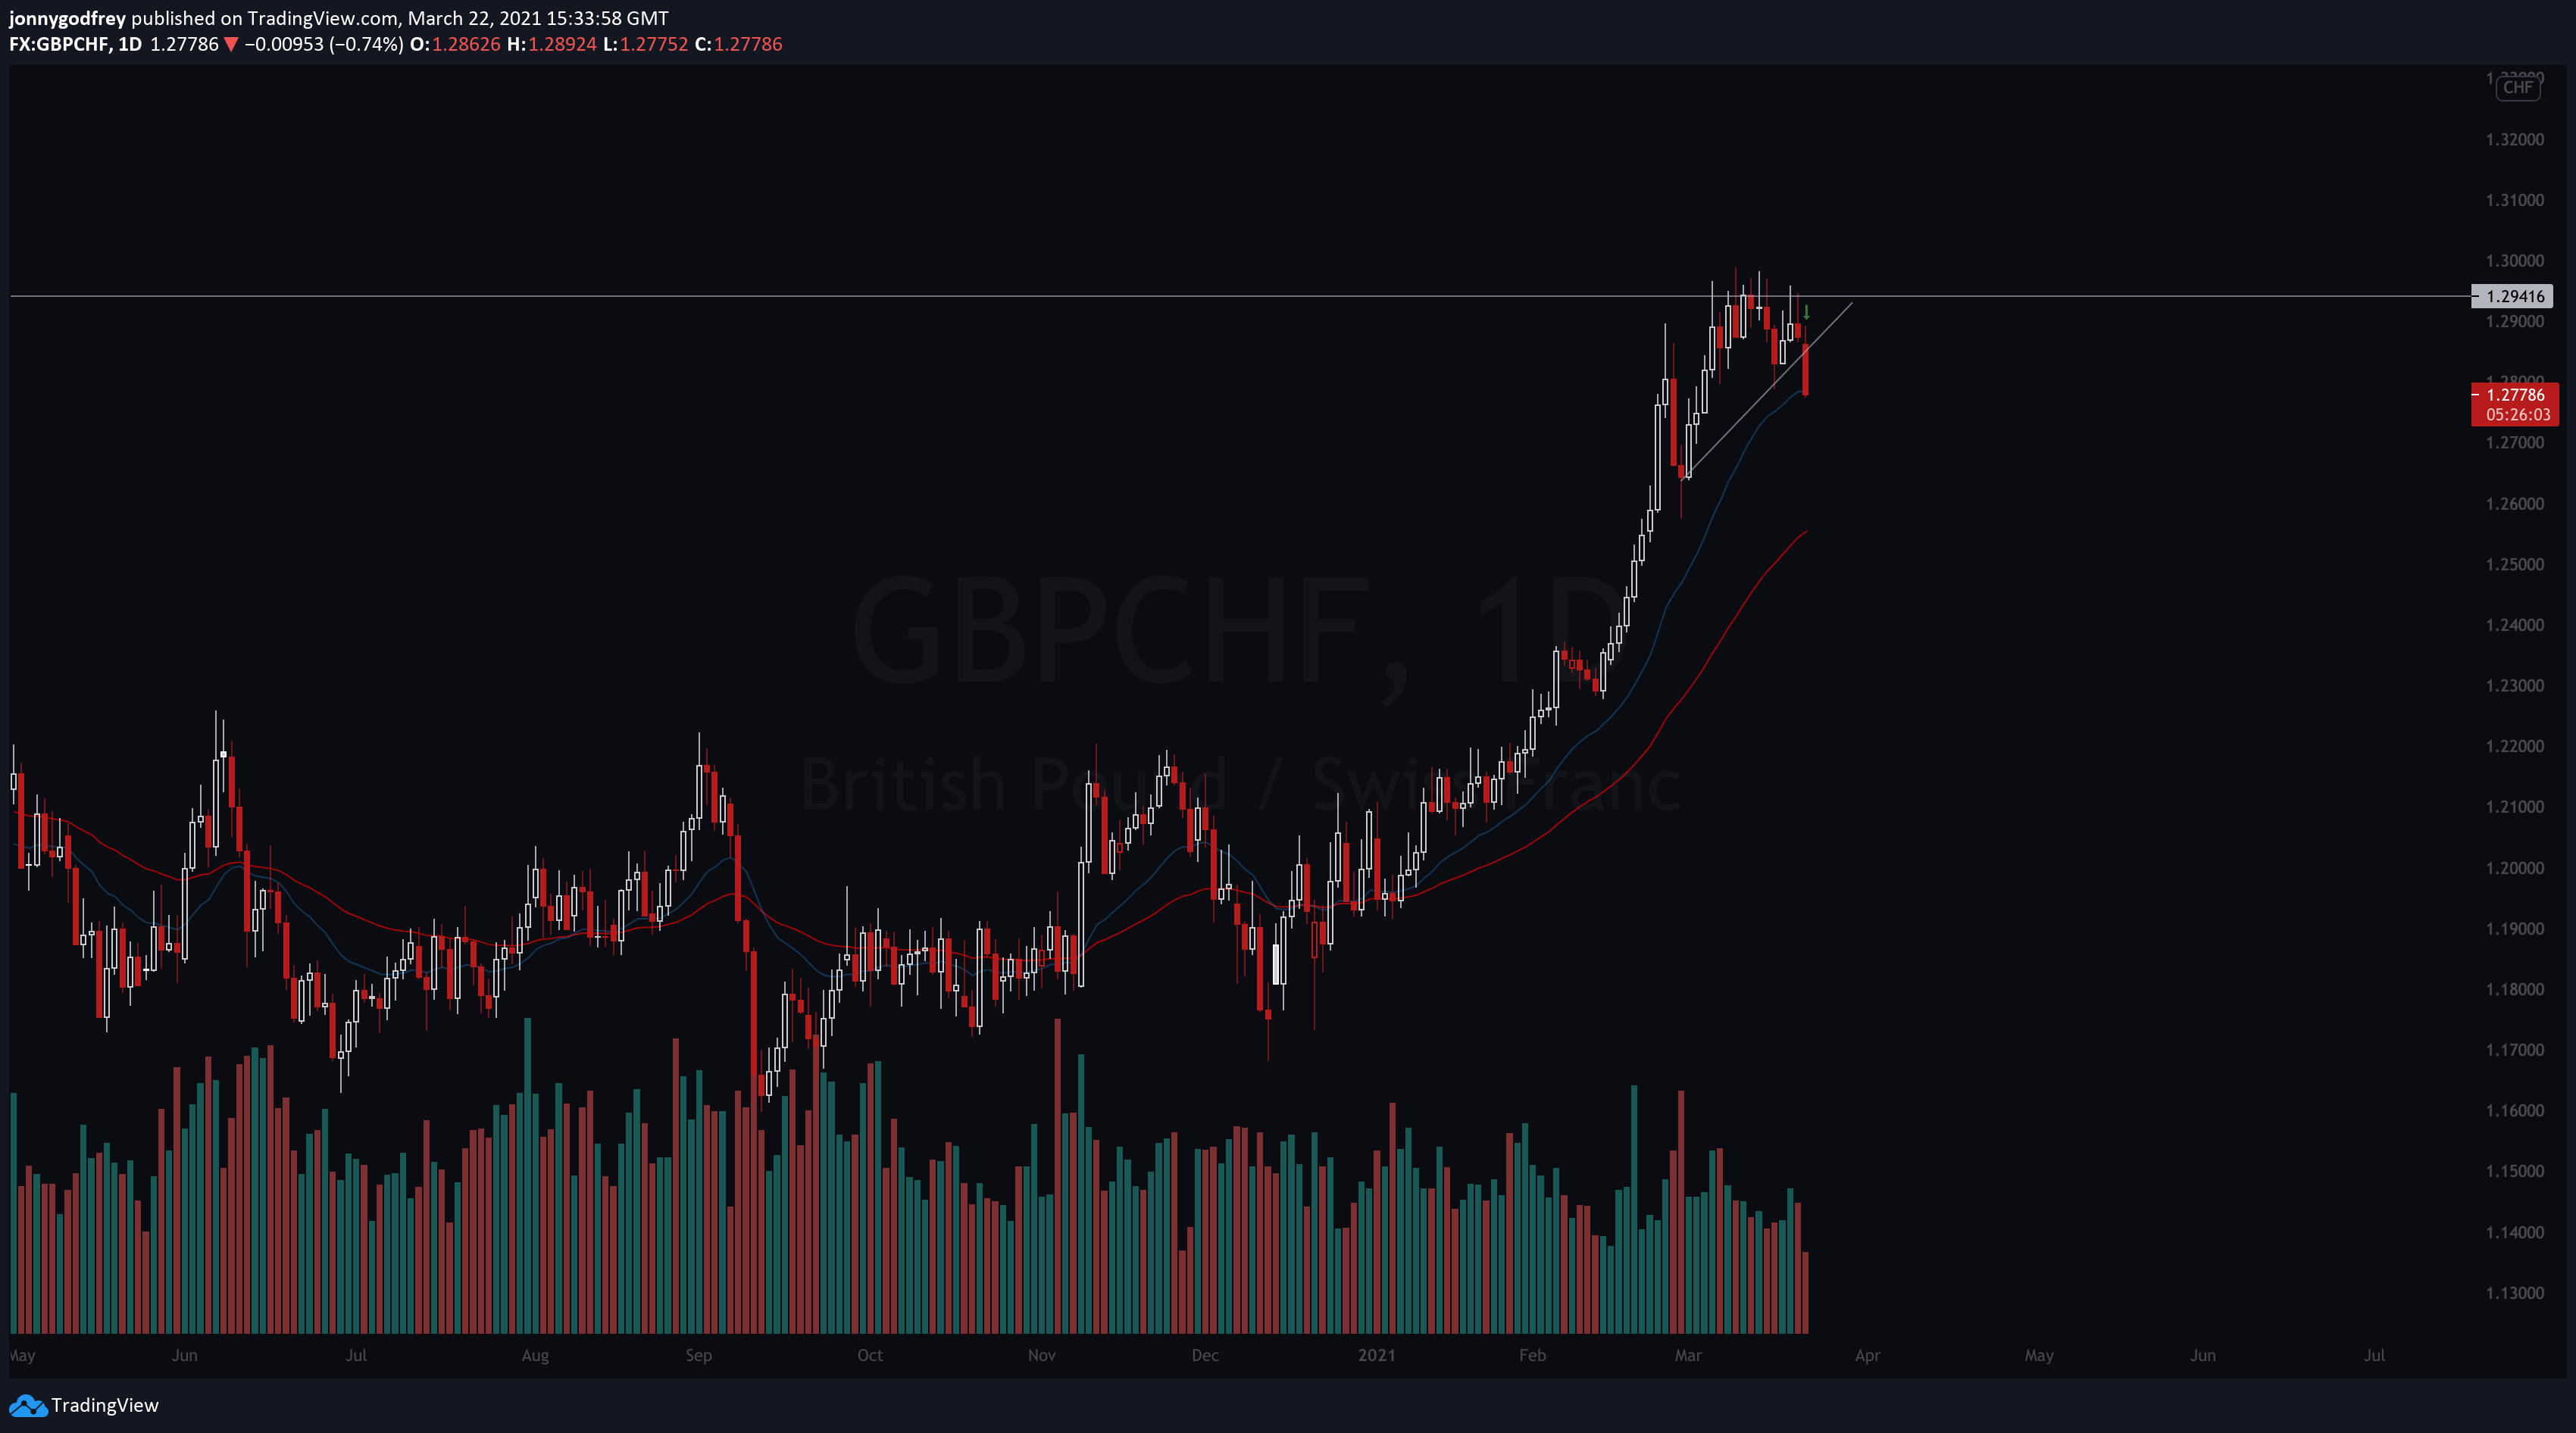 GBPCHF daily chart